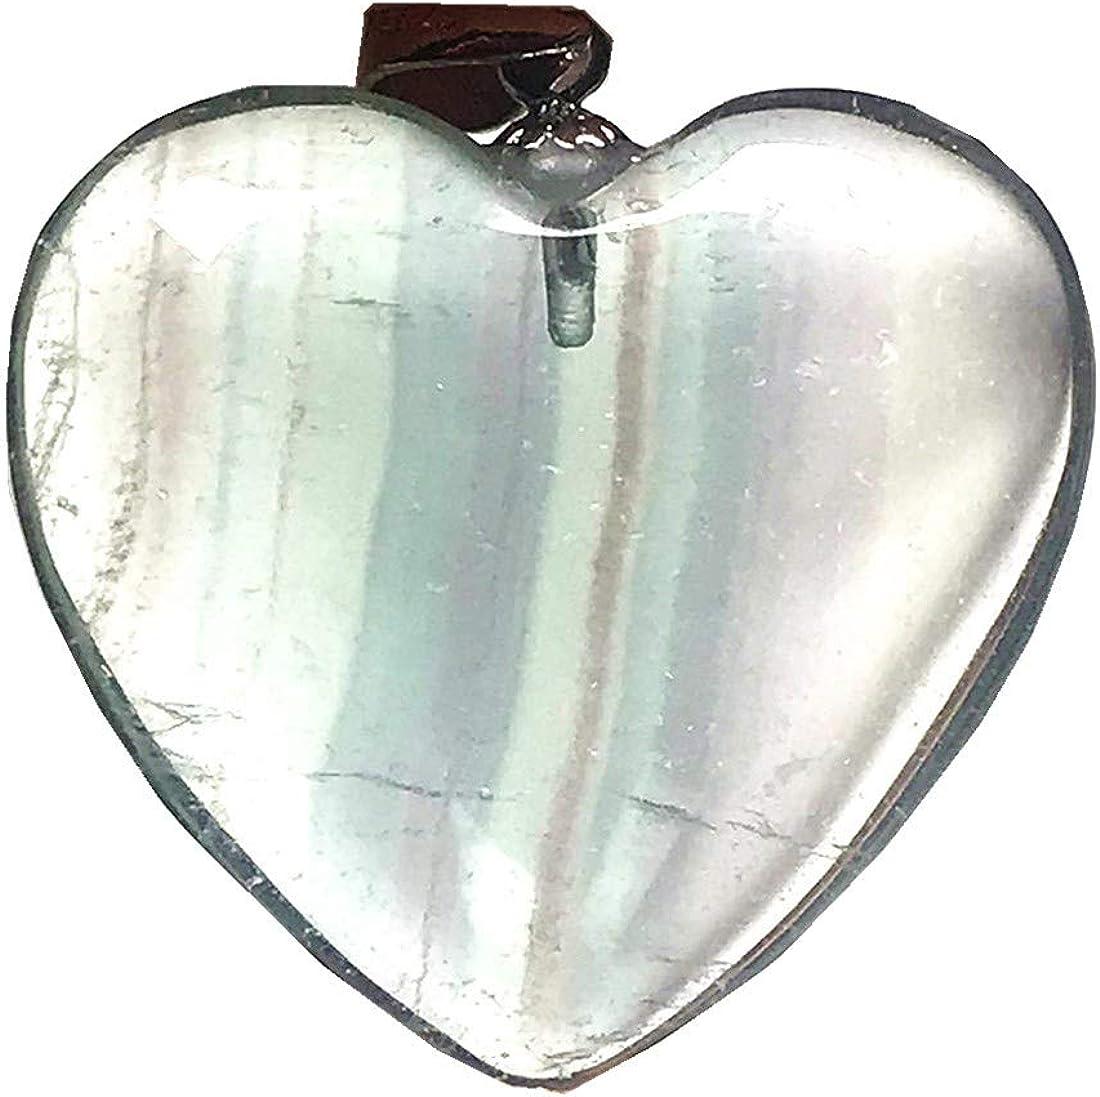 DUOVEKT Natural Green Fluorite Heart Pendant Jewelry for Woman Man 24x7mm Crystal Beads 925 Silver Purple Gemstone AAAAA